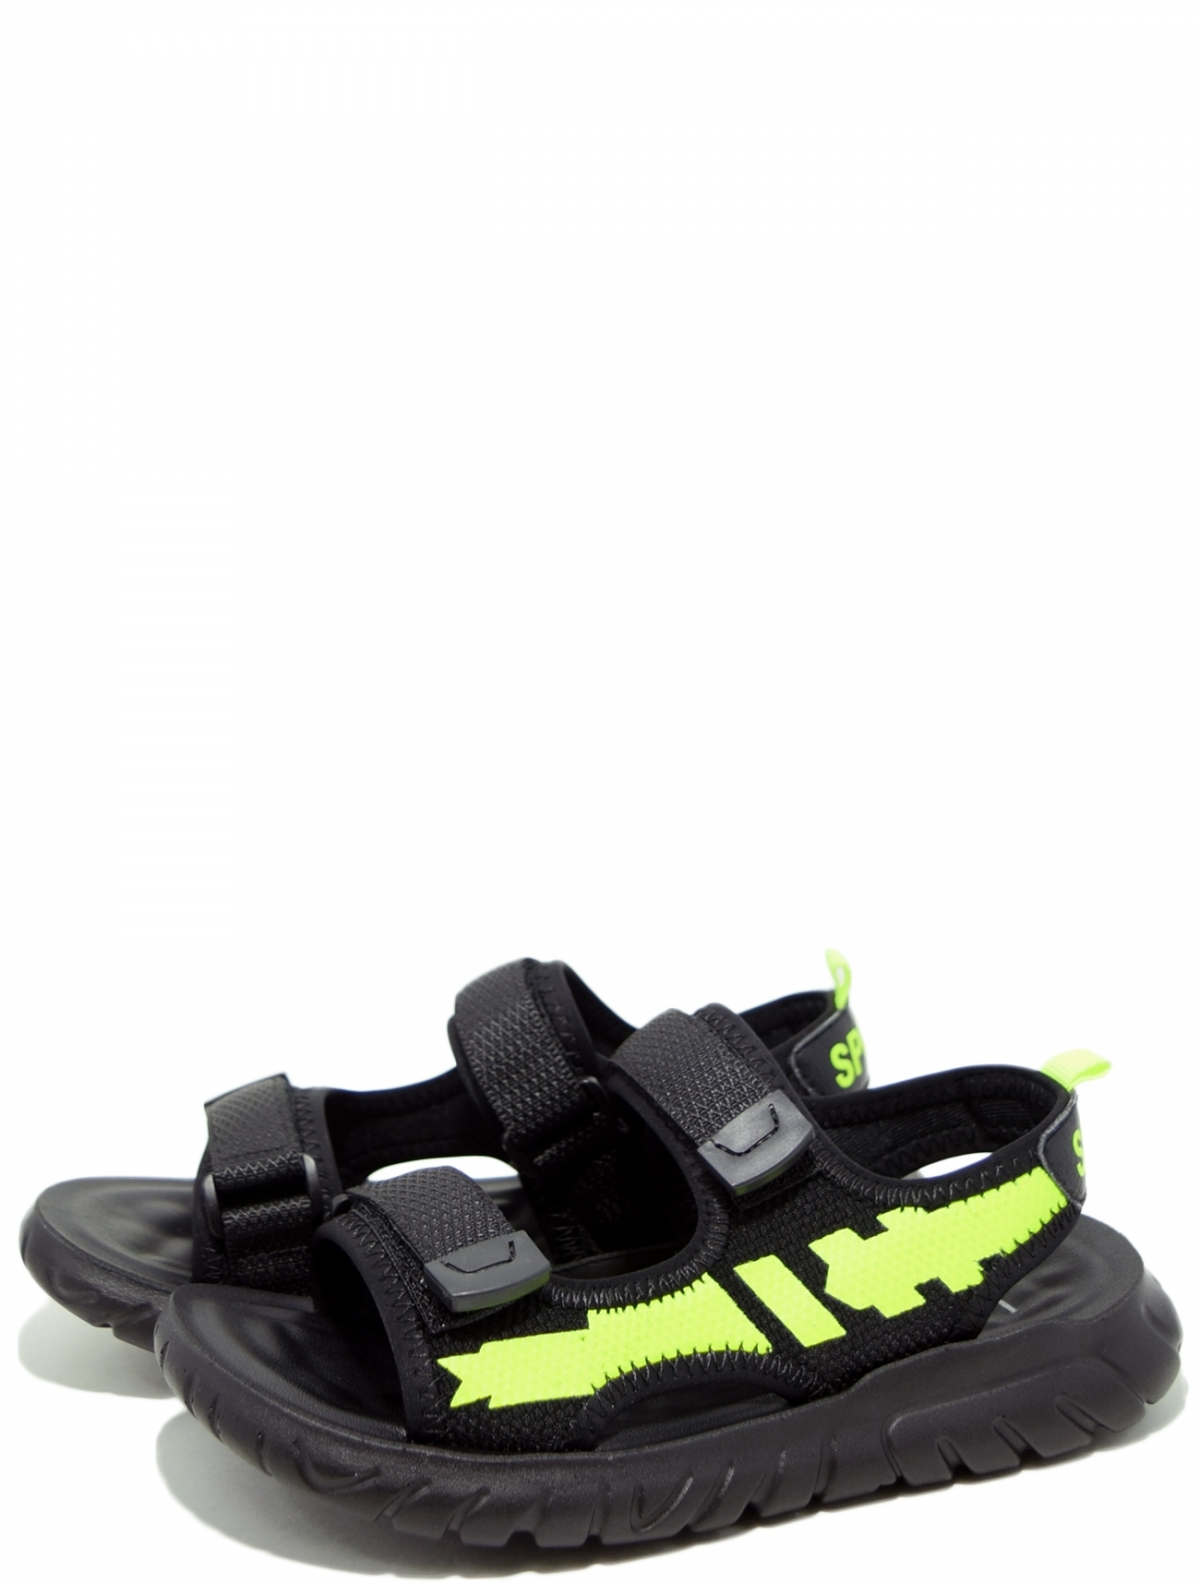 Ulet 1009-18 сандали для мальчика